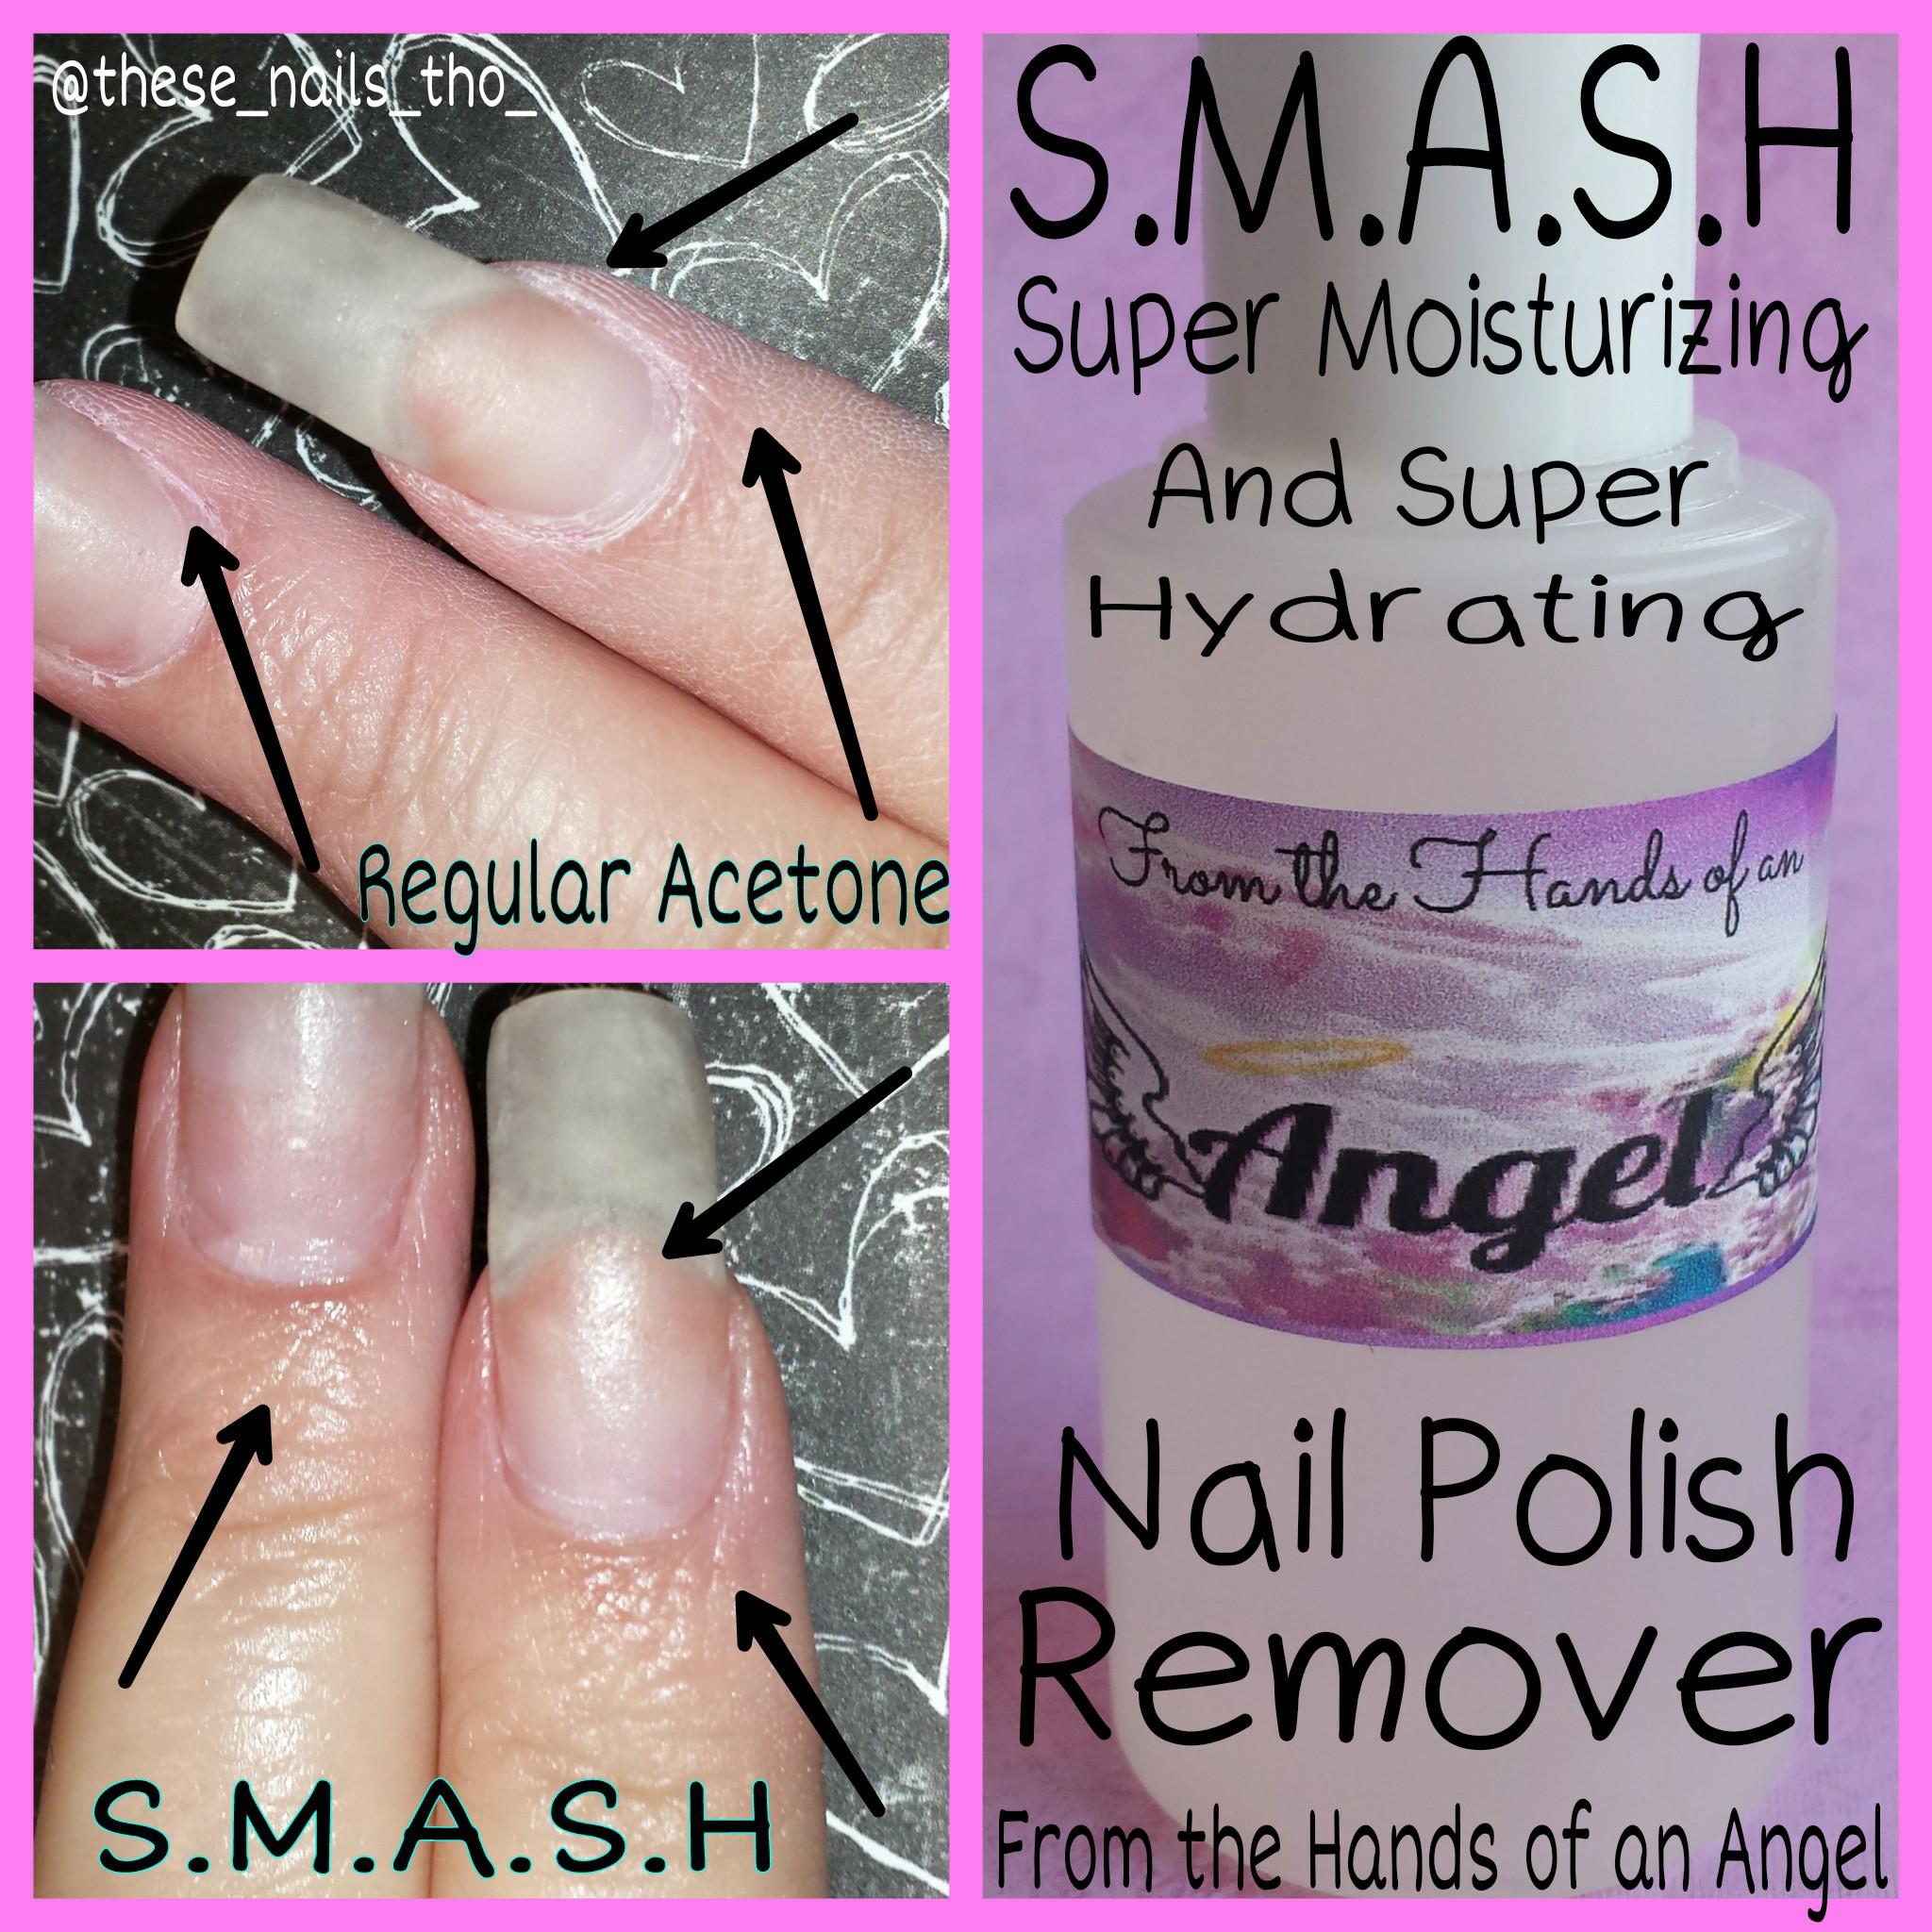 8 oz. Nail Polish Remover - Super Moisturizing And Super Hydrating ...